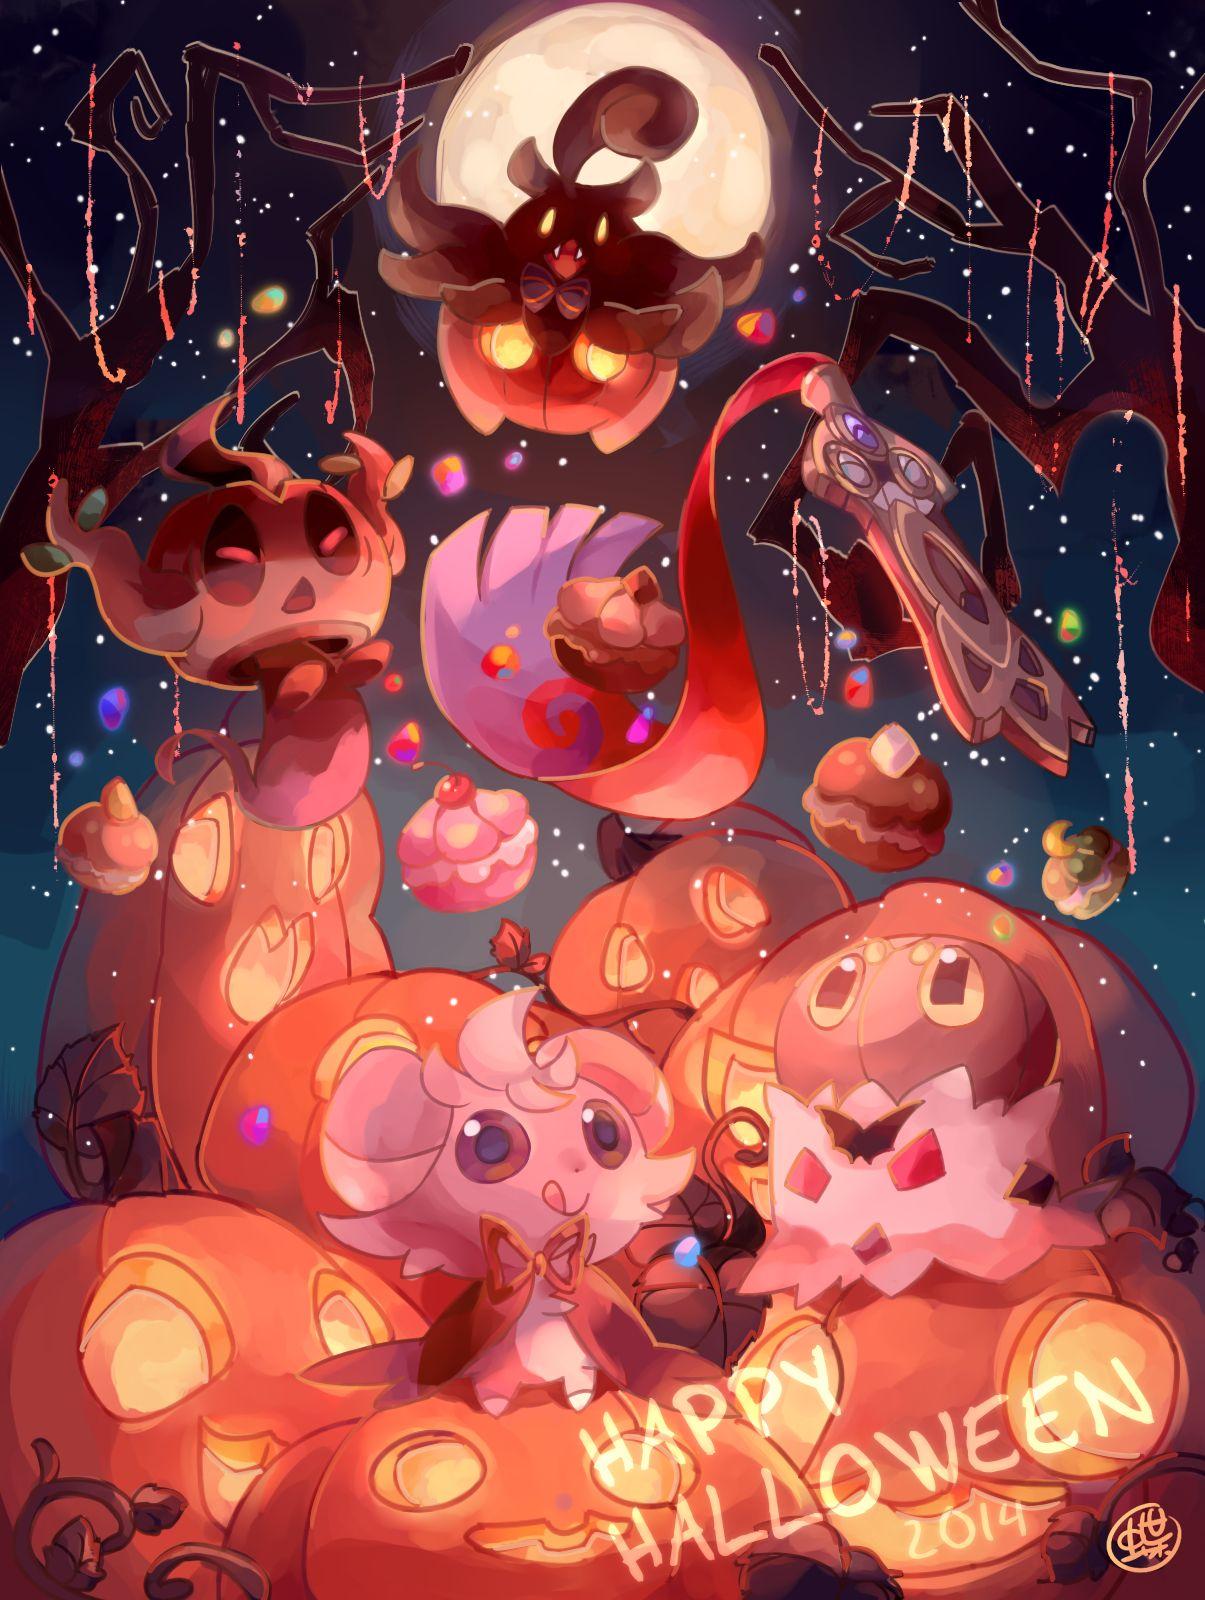 pokémon halloween pokemon pinterest pokémon anime and